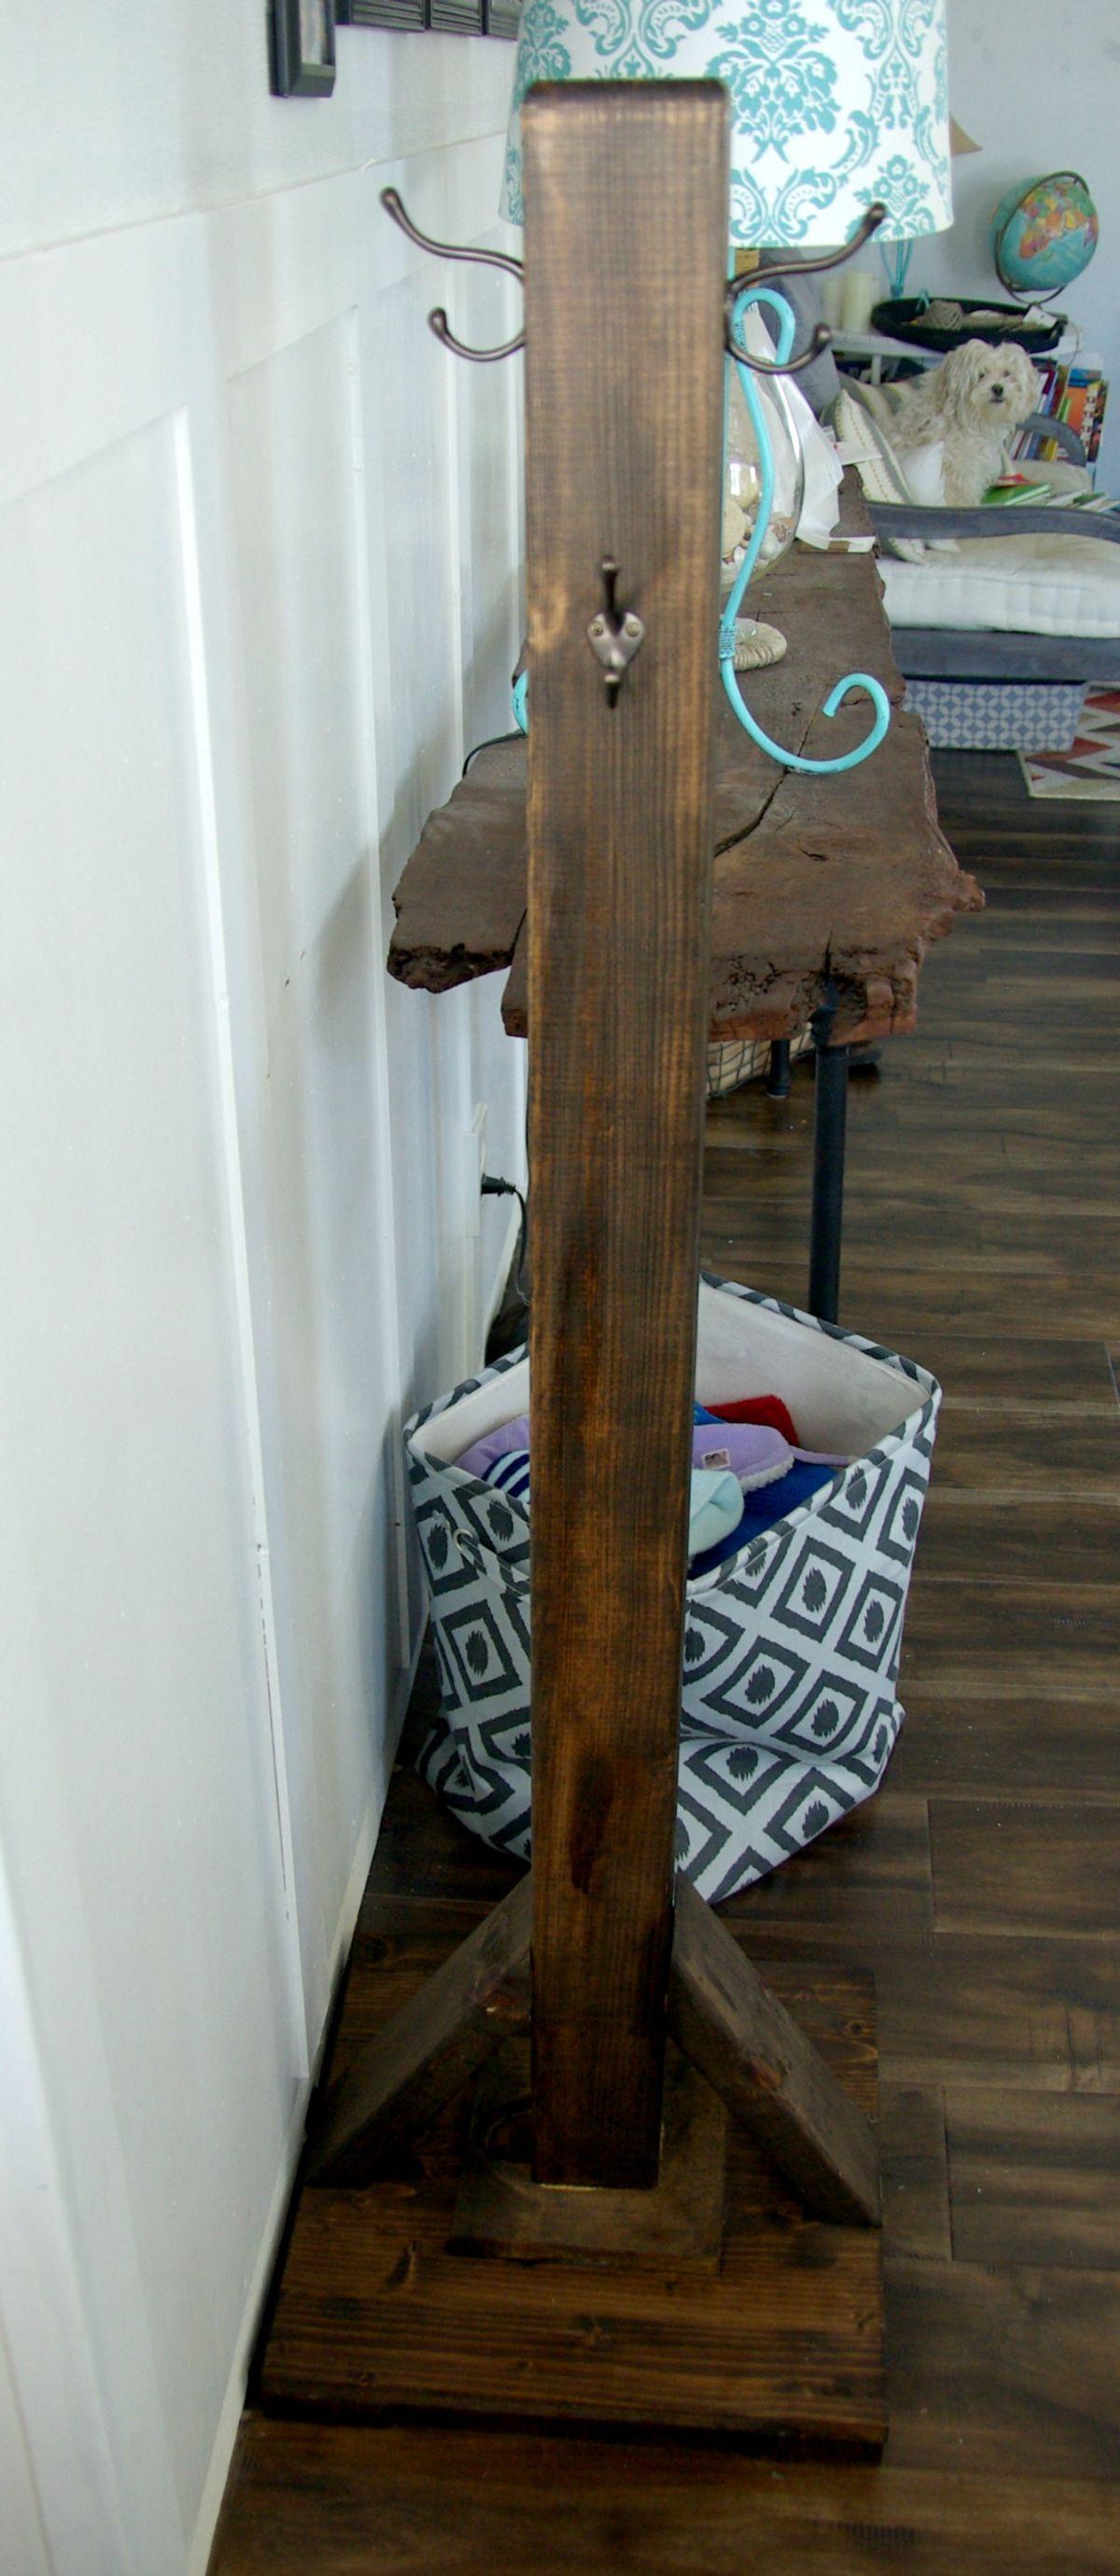 Best ideas about DIY Coat Racks . Save or Pin DIY Wood Coat Rack Now.